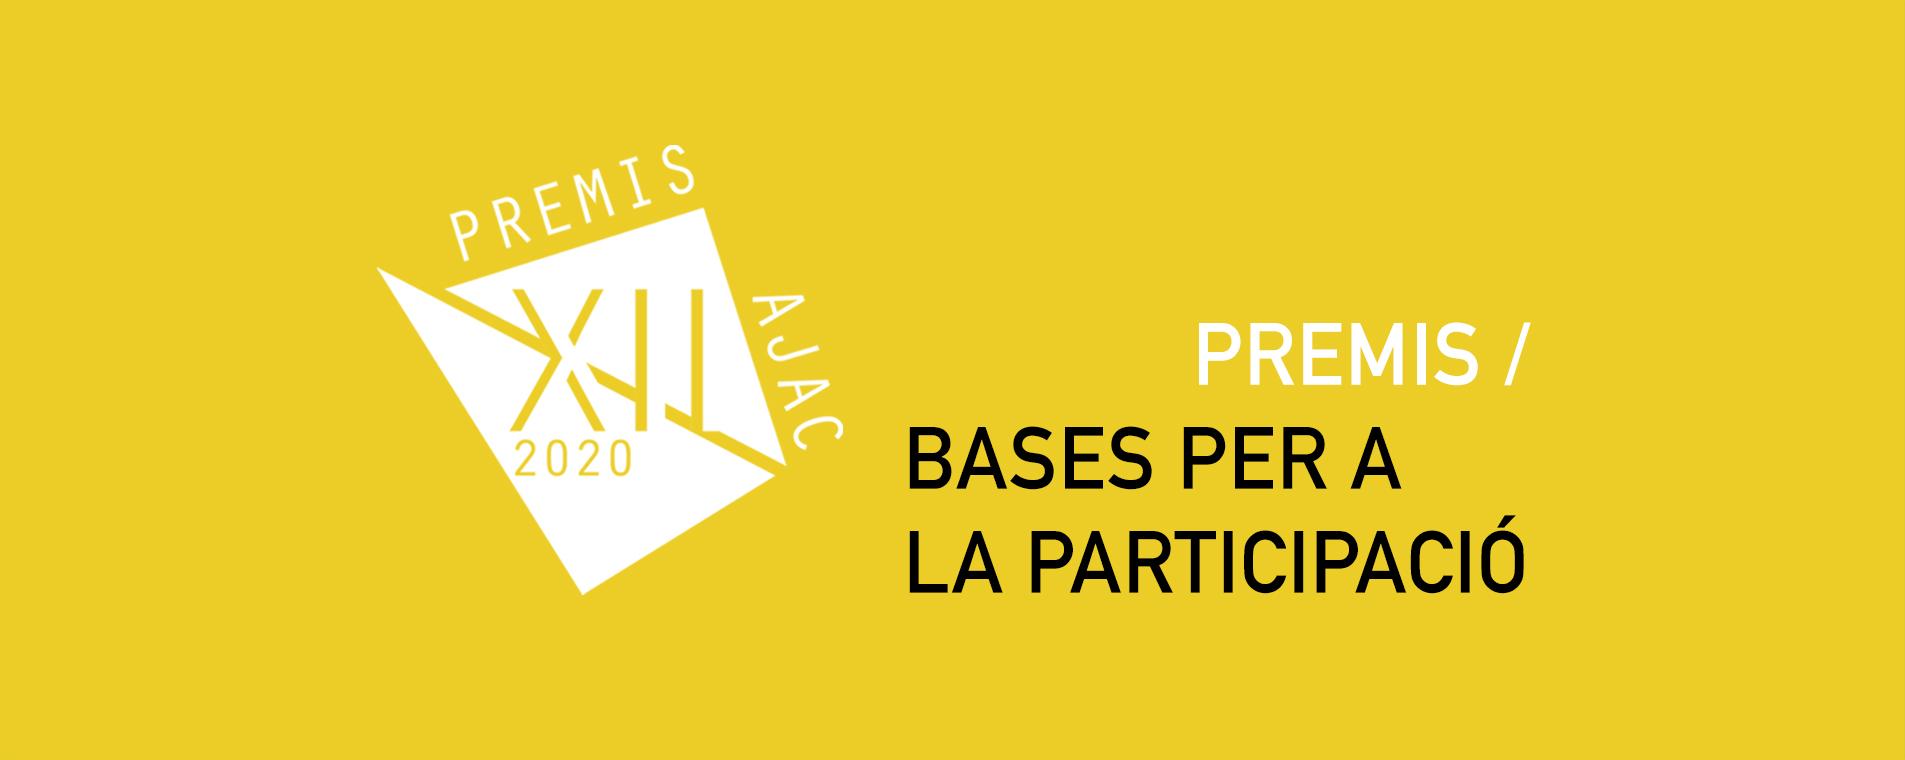 PremisXII_Bases